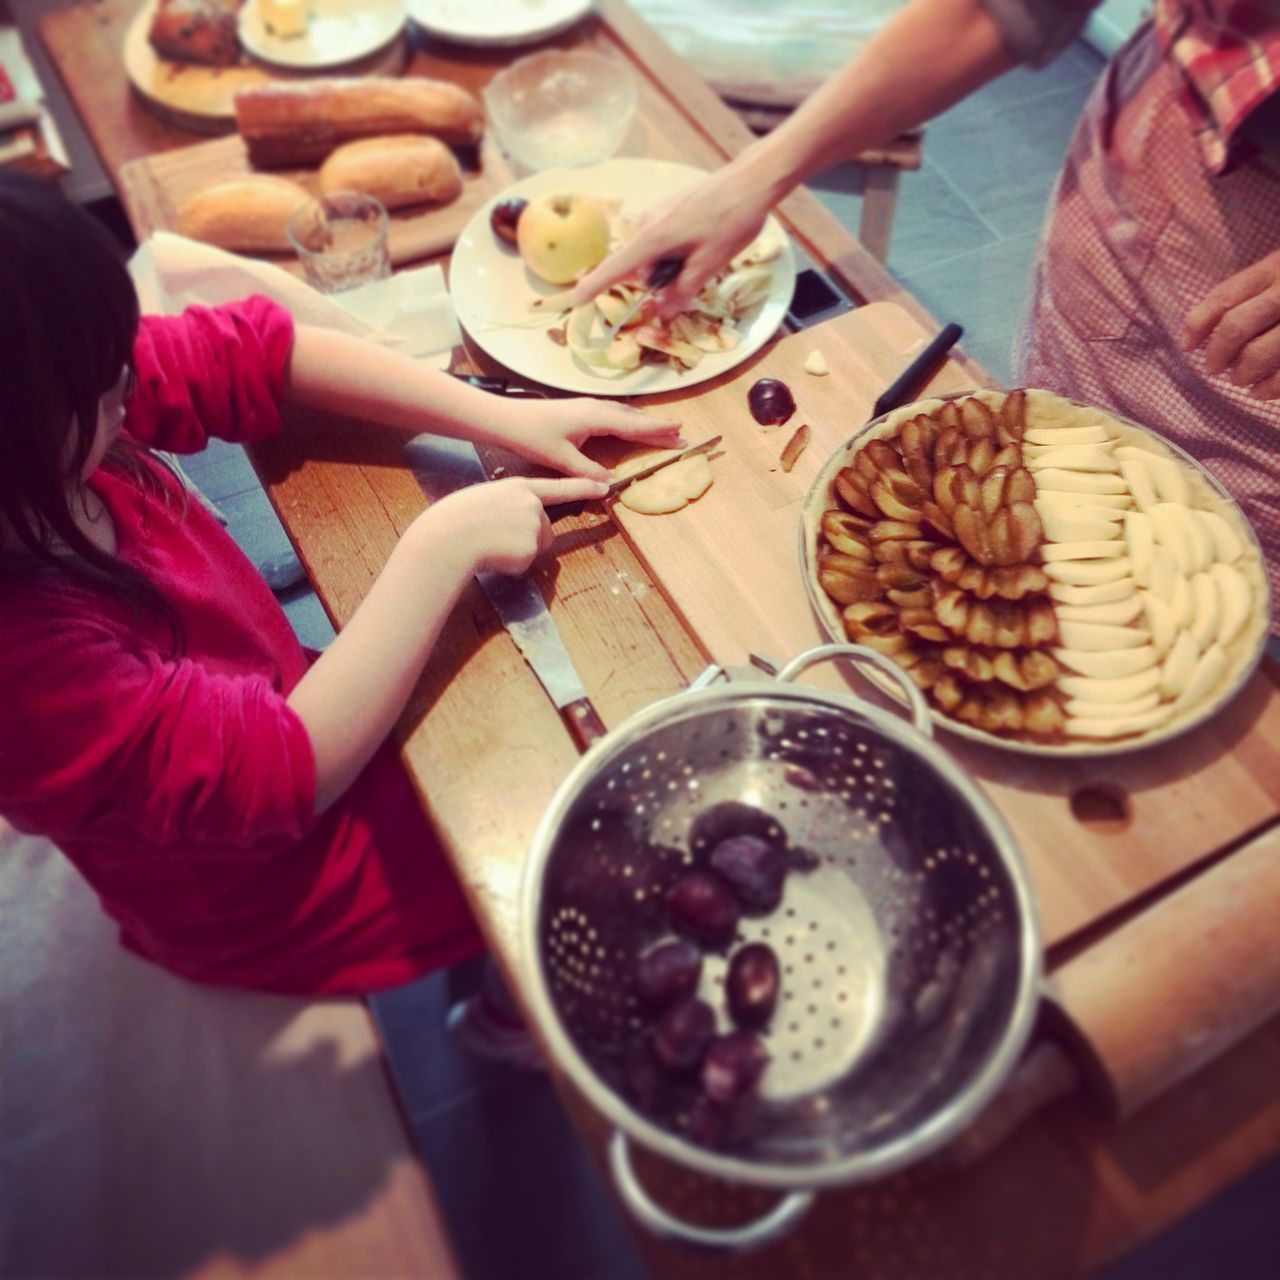 Family baking cake in domestic kitchen